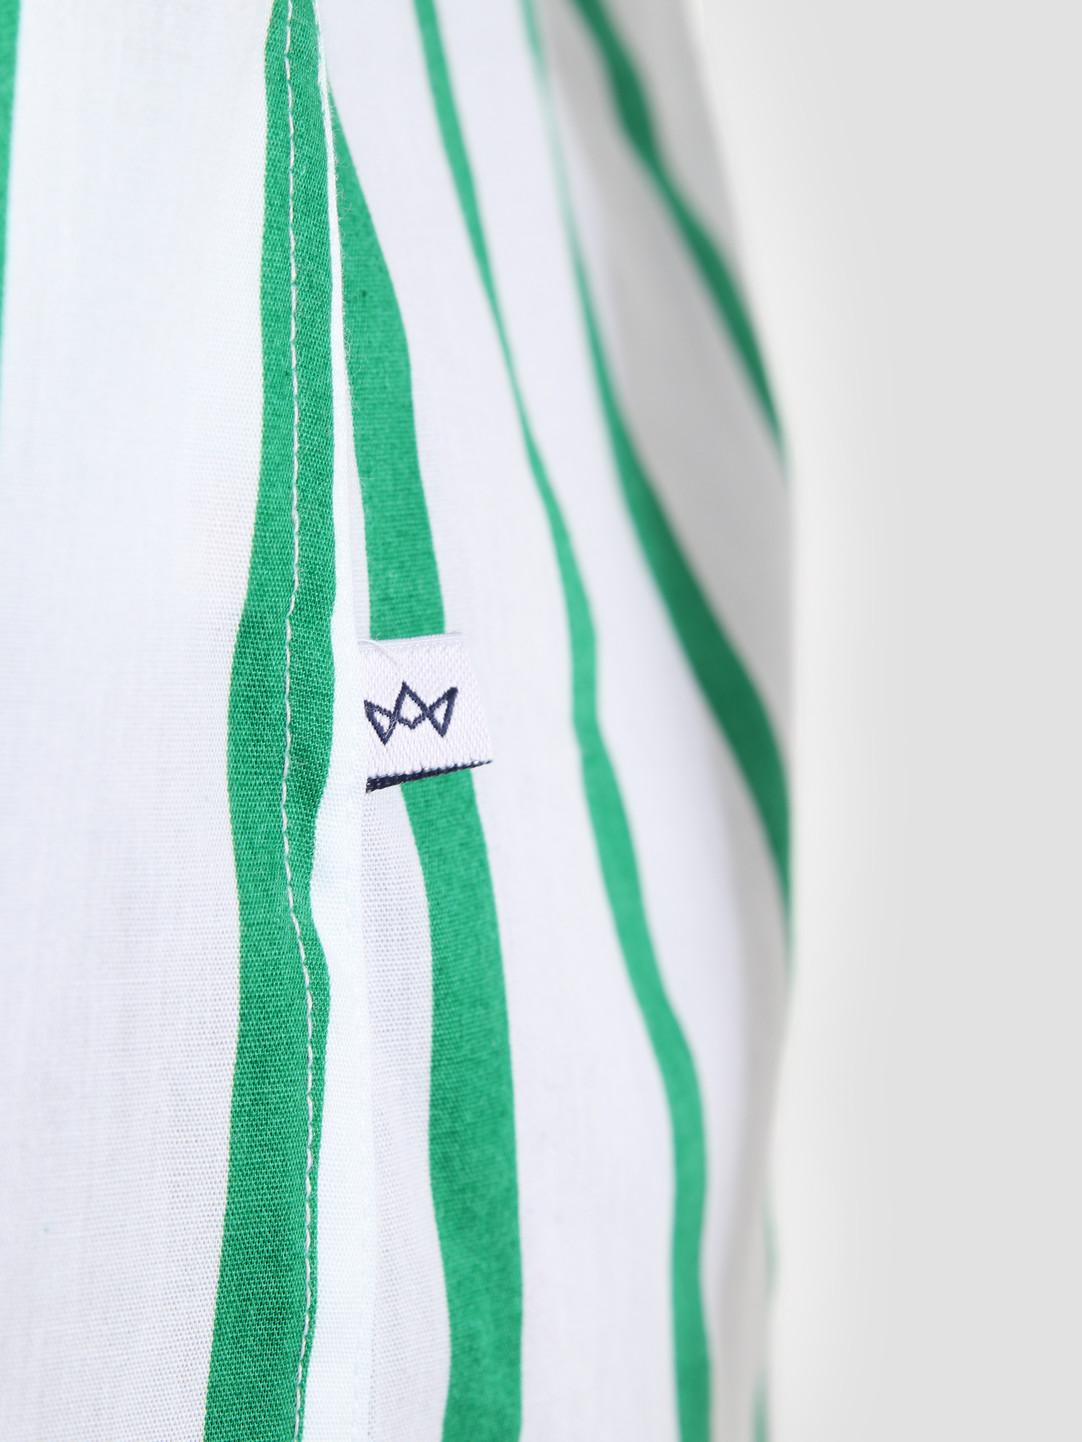 Kronstadt Kronstadt Cuba Short Sleeve Shirt Gr.88 White Green KS2669